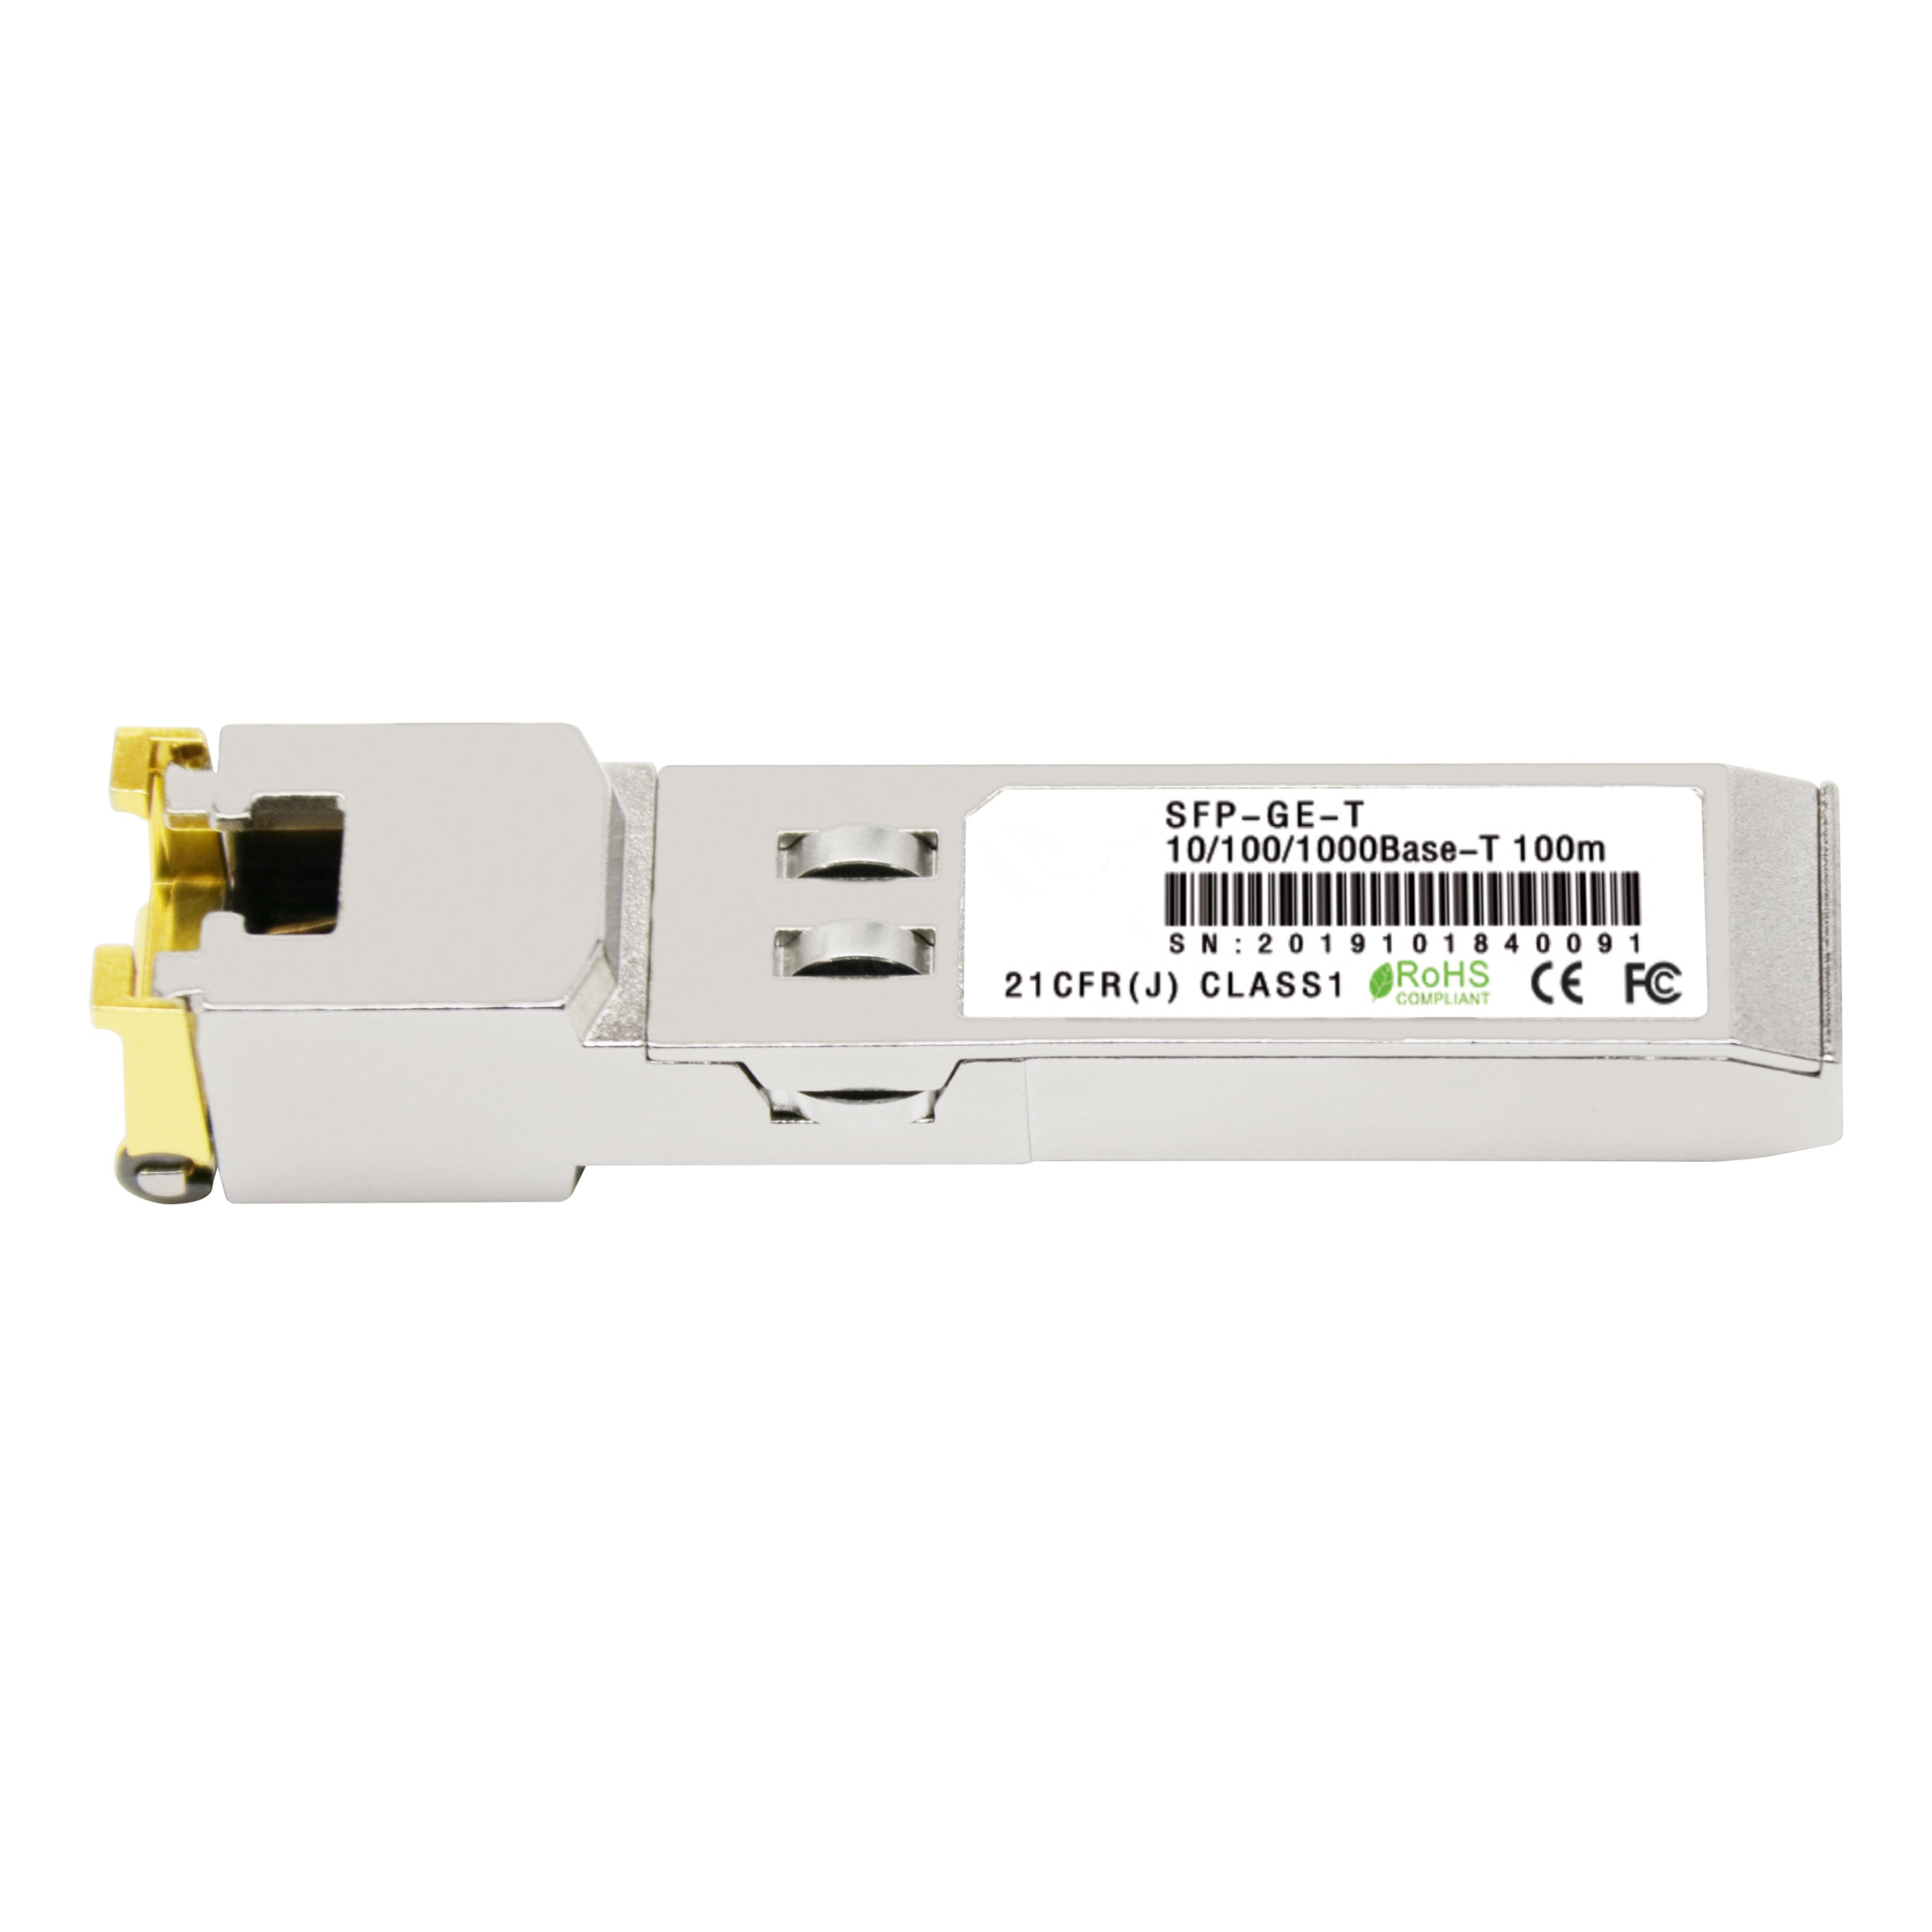 Gigabit RJ45 módulo SFP 1000Mbps SFP cobre RJ45 transceptor SFP módulo Compatible con Cisco/Mikrotik Gigabit Ethernet